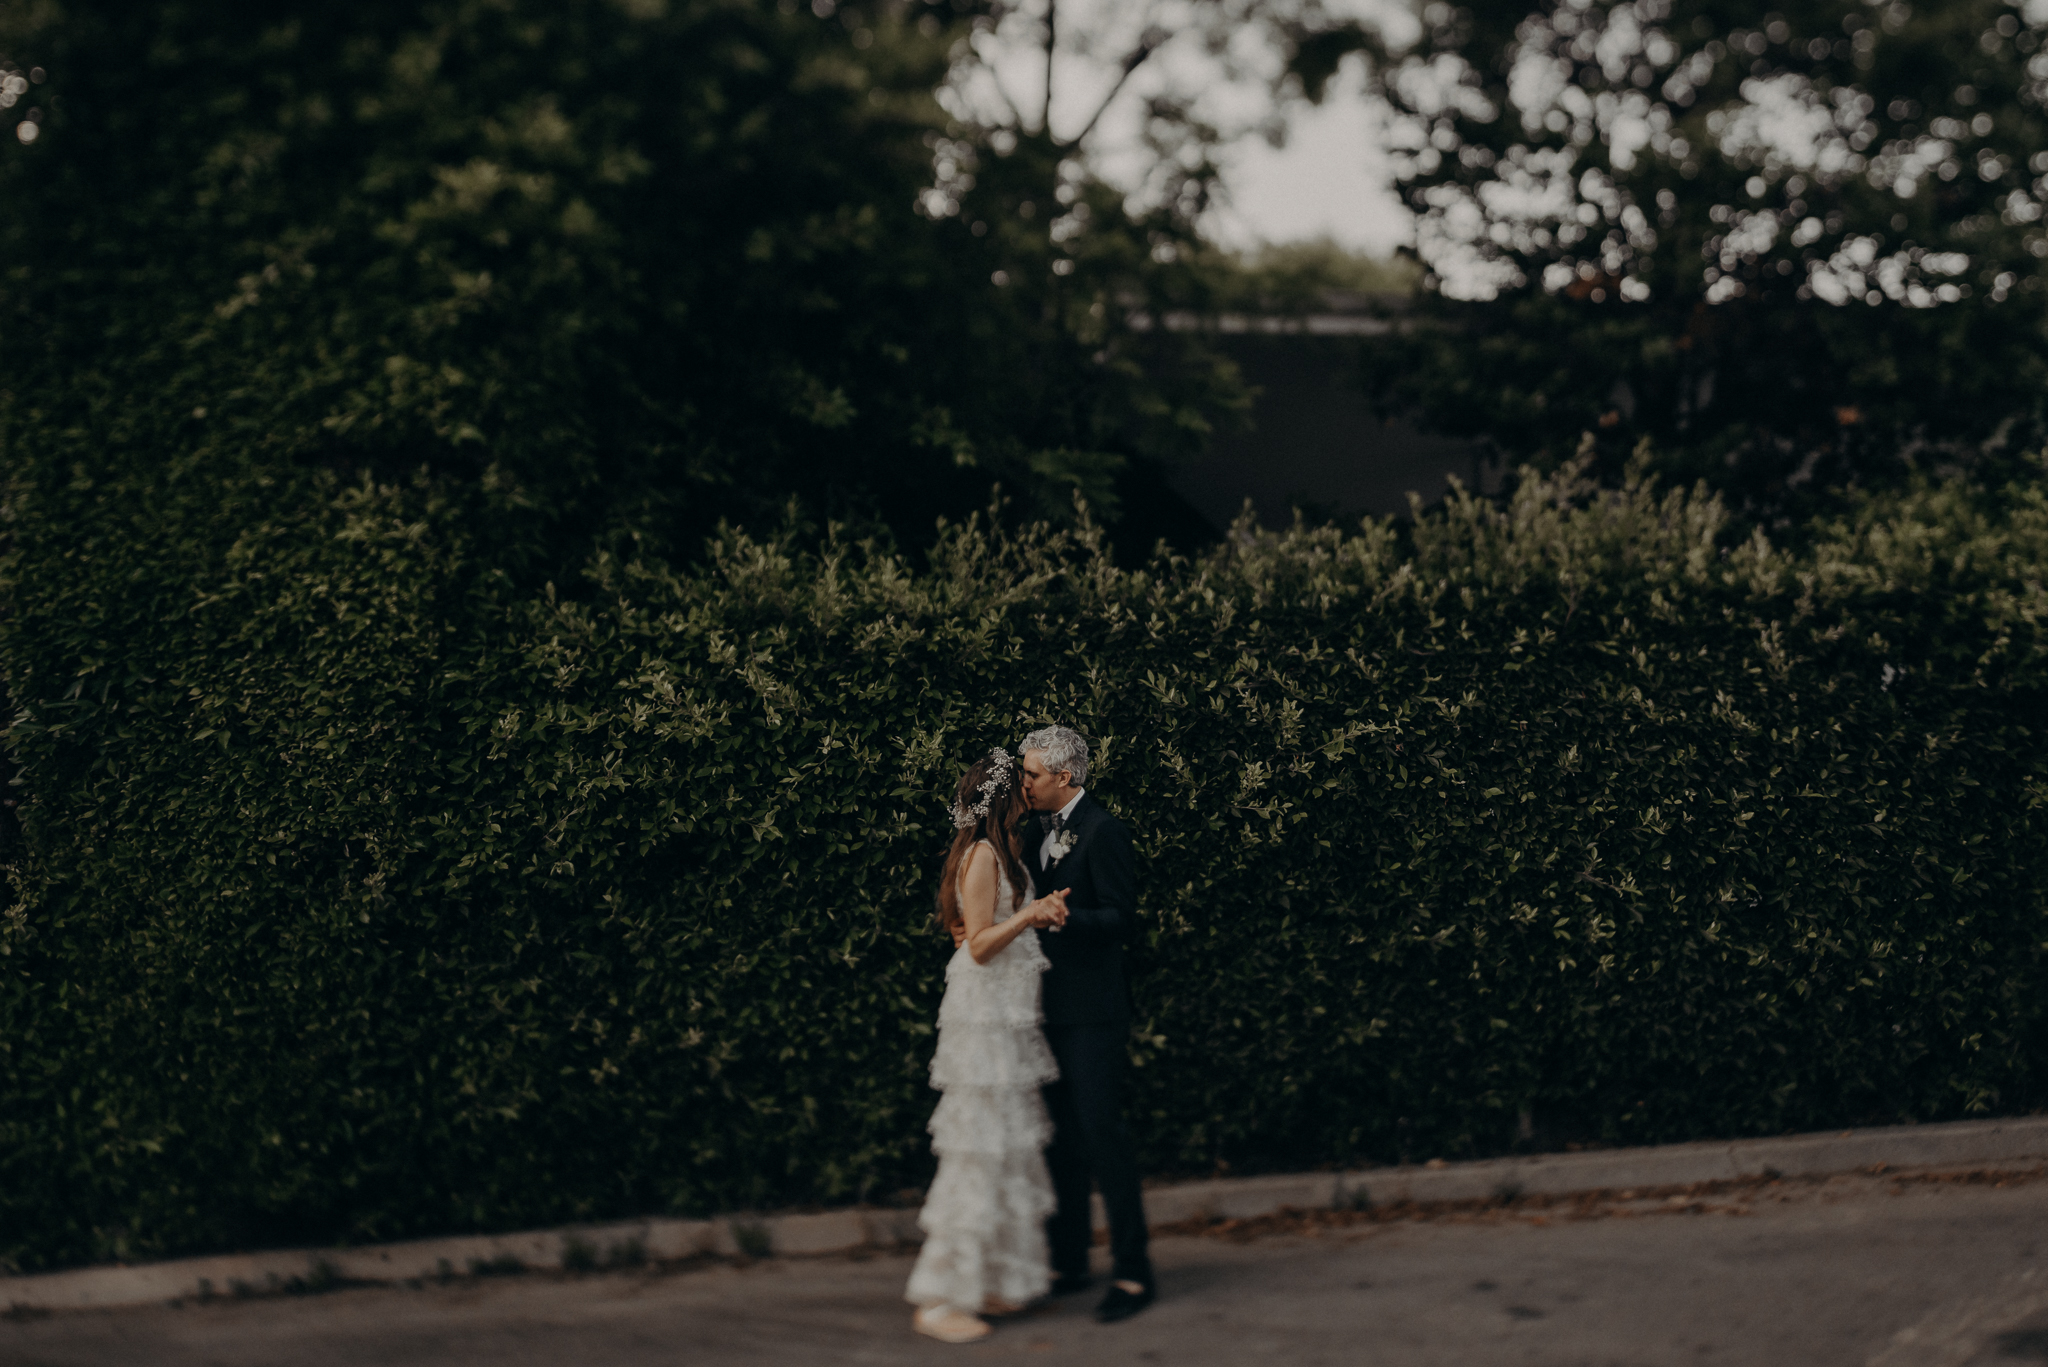 Isaiah + Taylor Photography - Private Estate Backyard Wedding - Beverly Hills - Los Angeles Wedding Photographer - 114.jpg